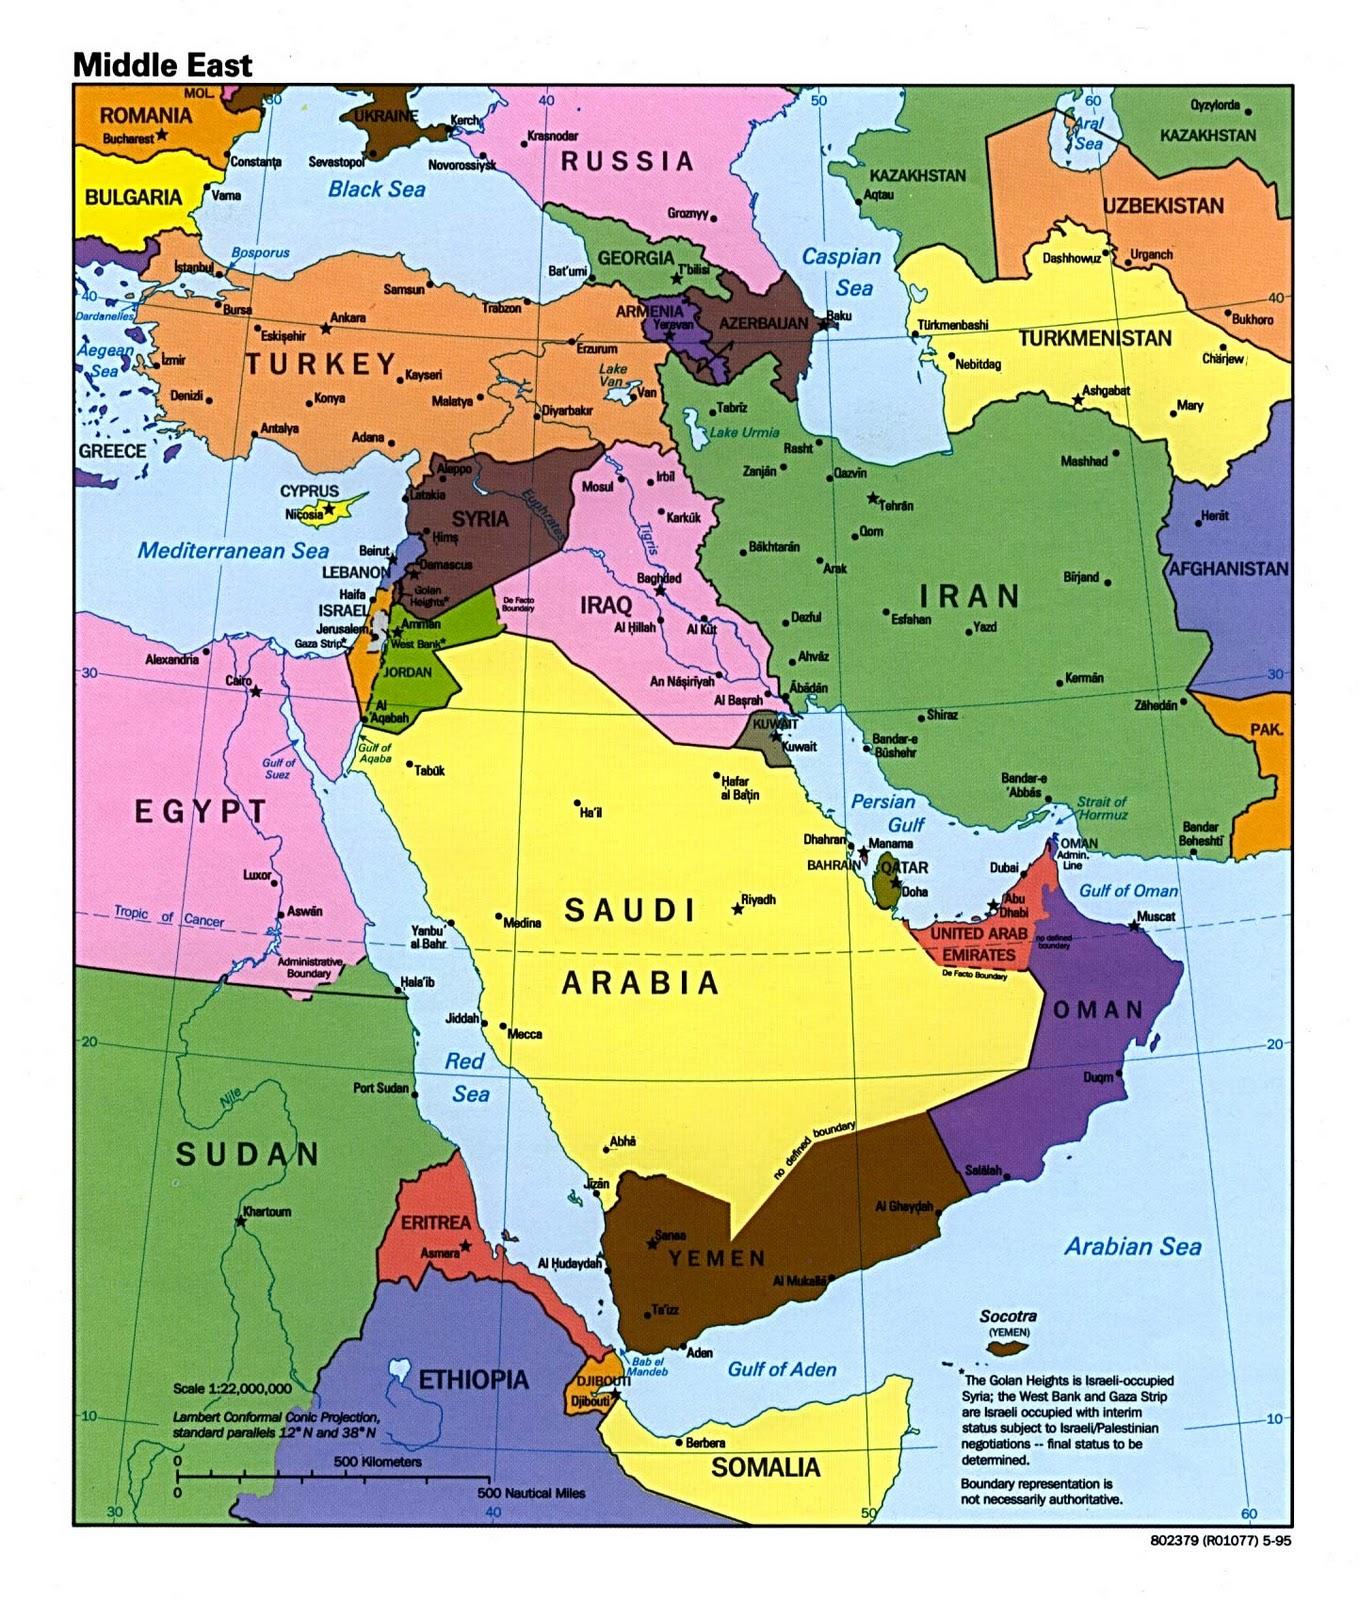 POLITICO MAFIOSO: NEXT TO FALL: SAUDI ARABIA By DICK MORRIS & EILEEN MCGANN